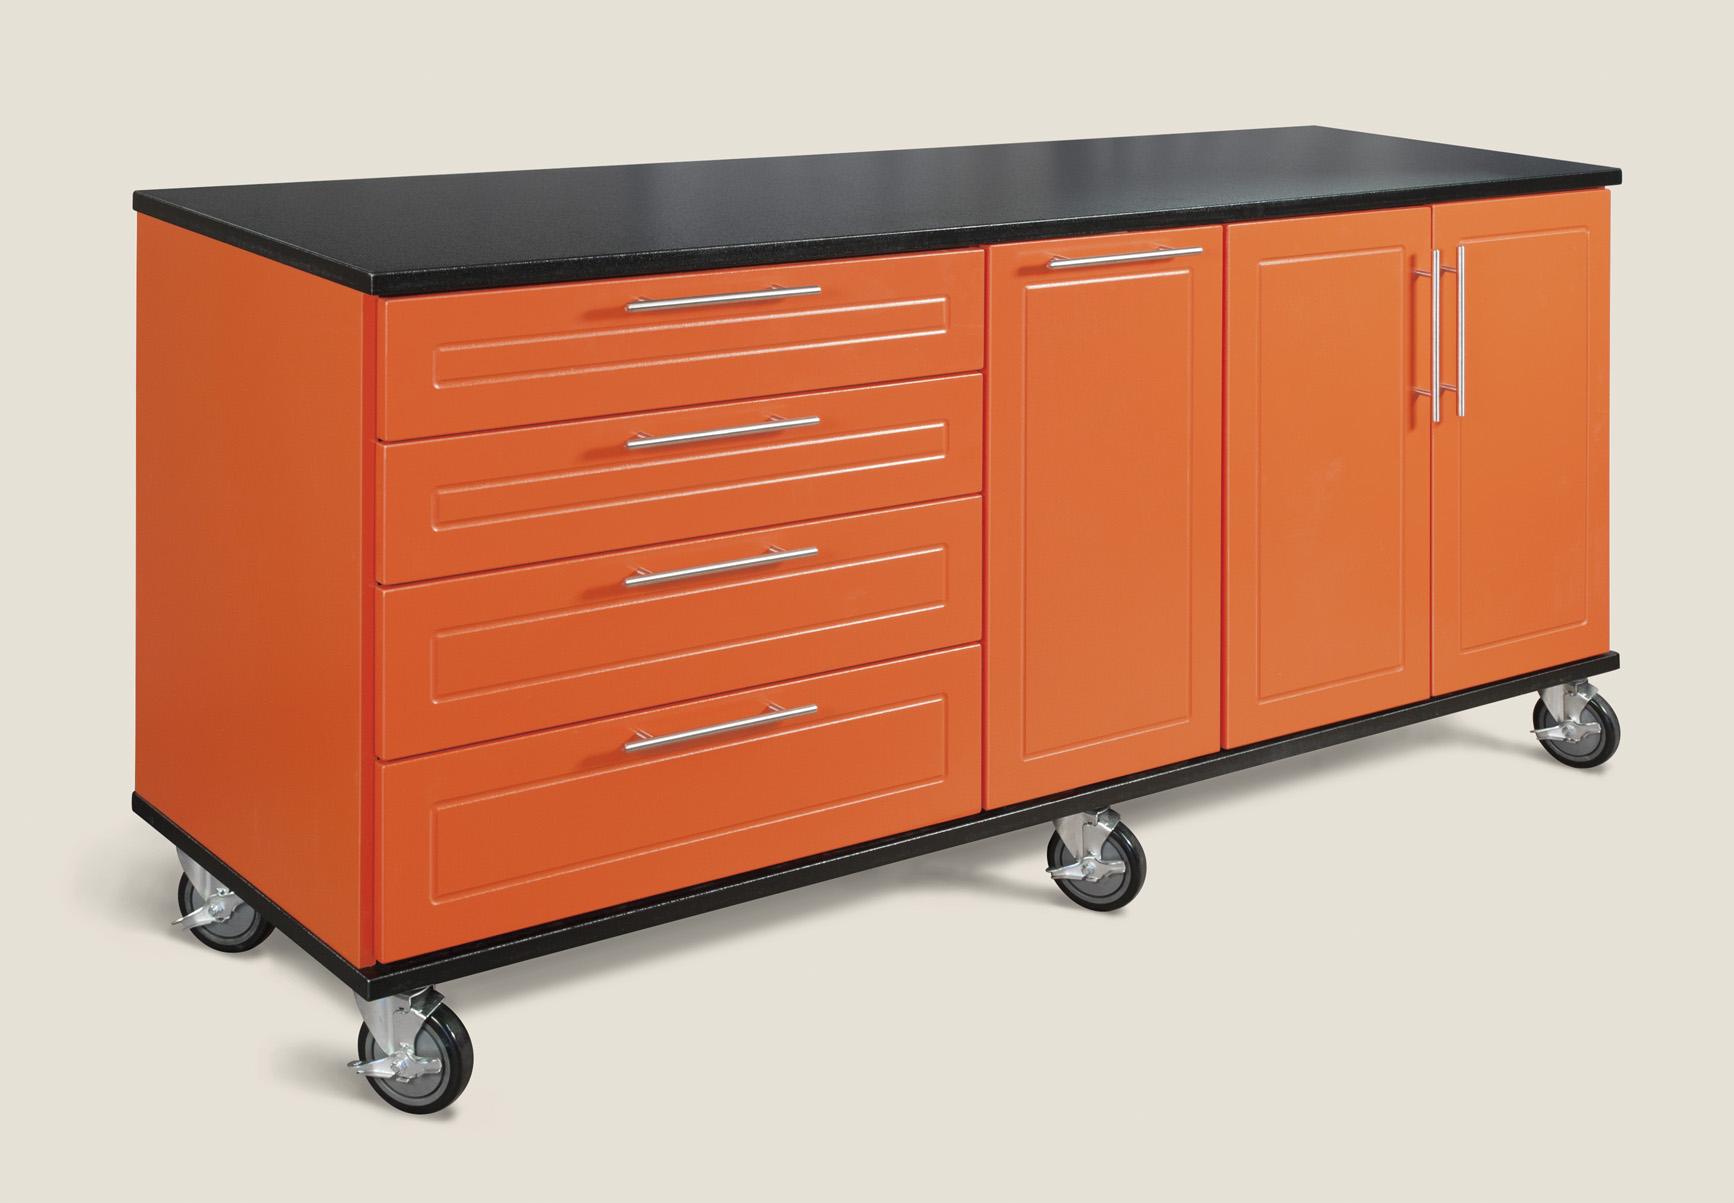 Garage WorkbenchA Garage Workbench Makes A Great Tool Organizer. ...